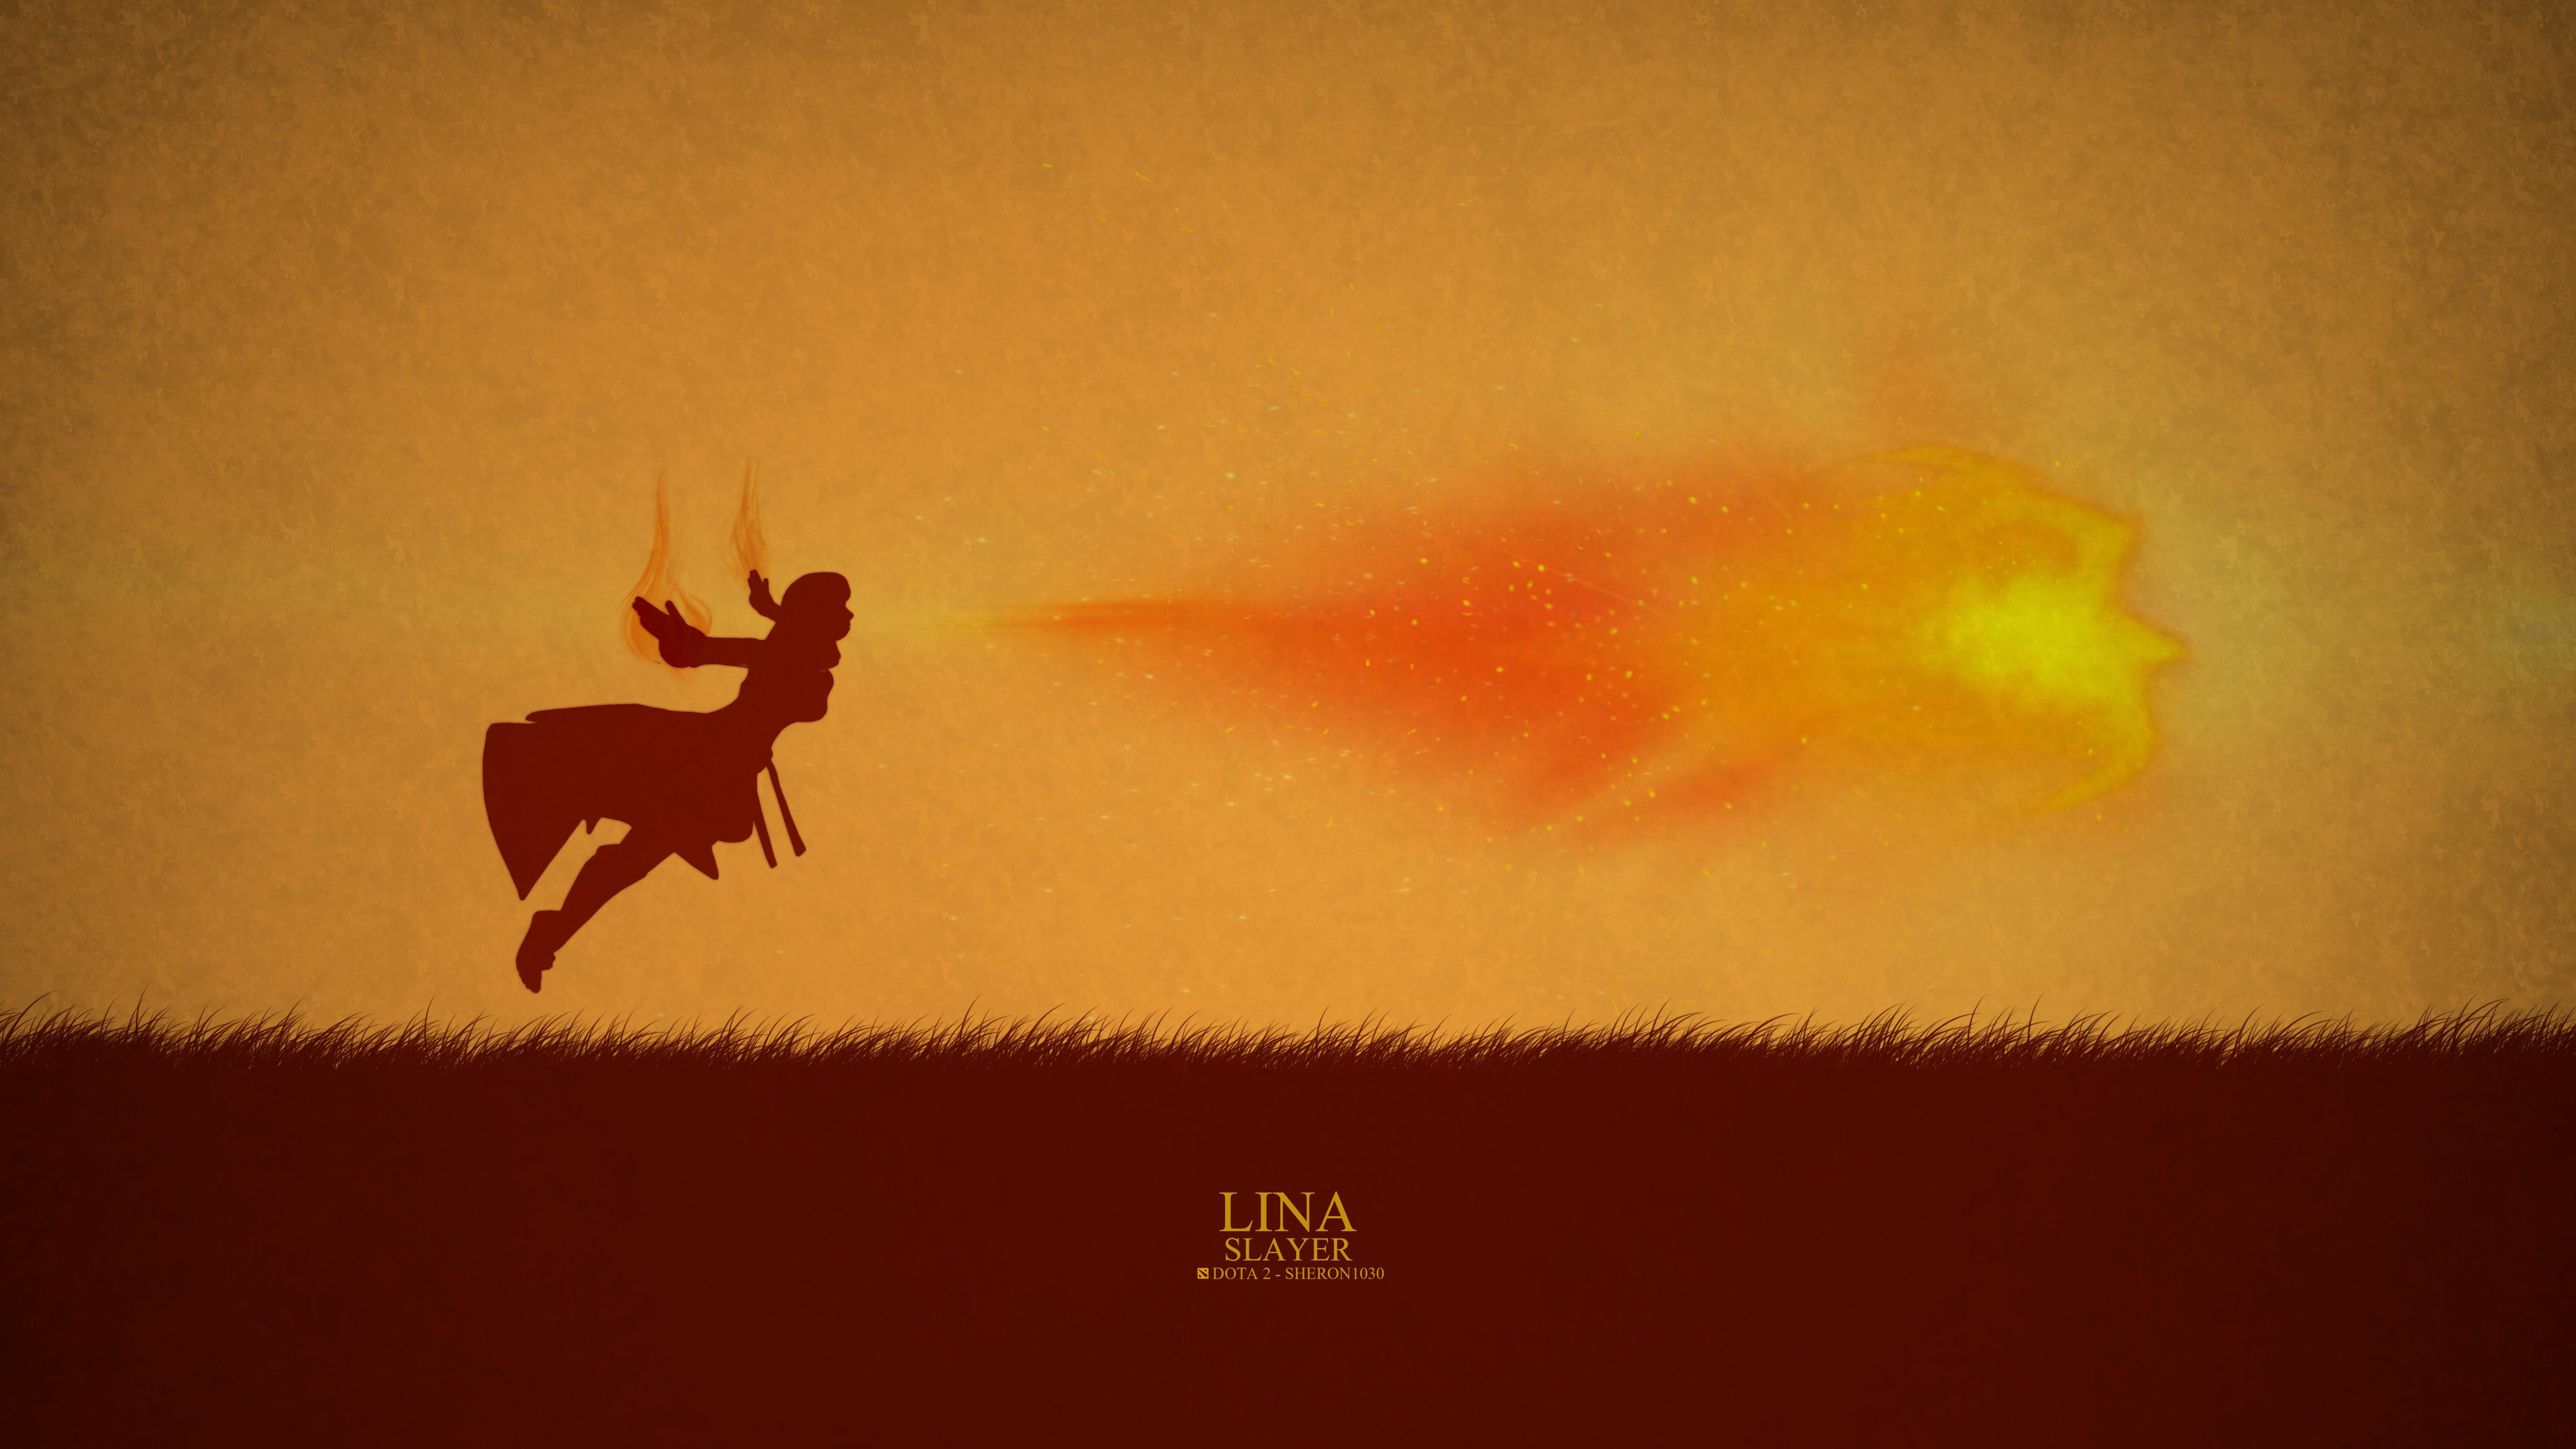 Lina Slayer Minimal Wallpaper Dota 2 HD Wallpapers 5000x2813